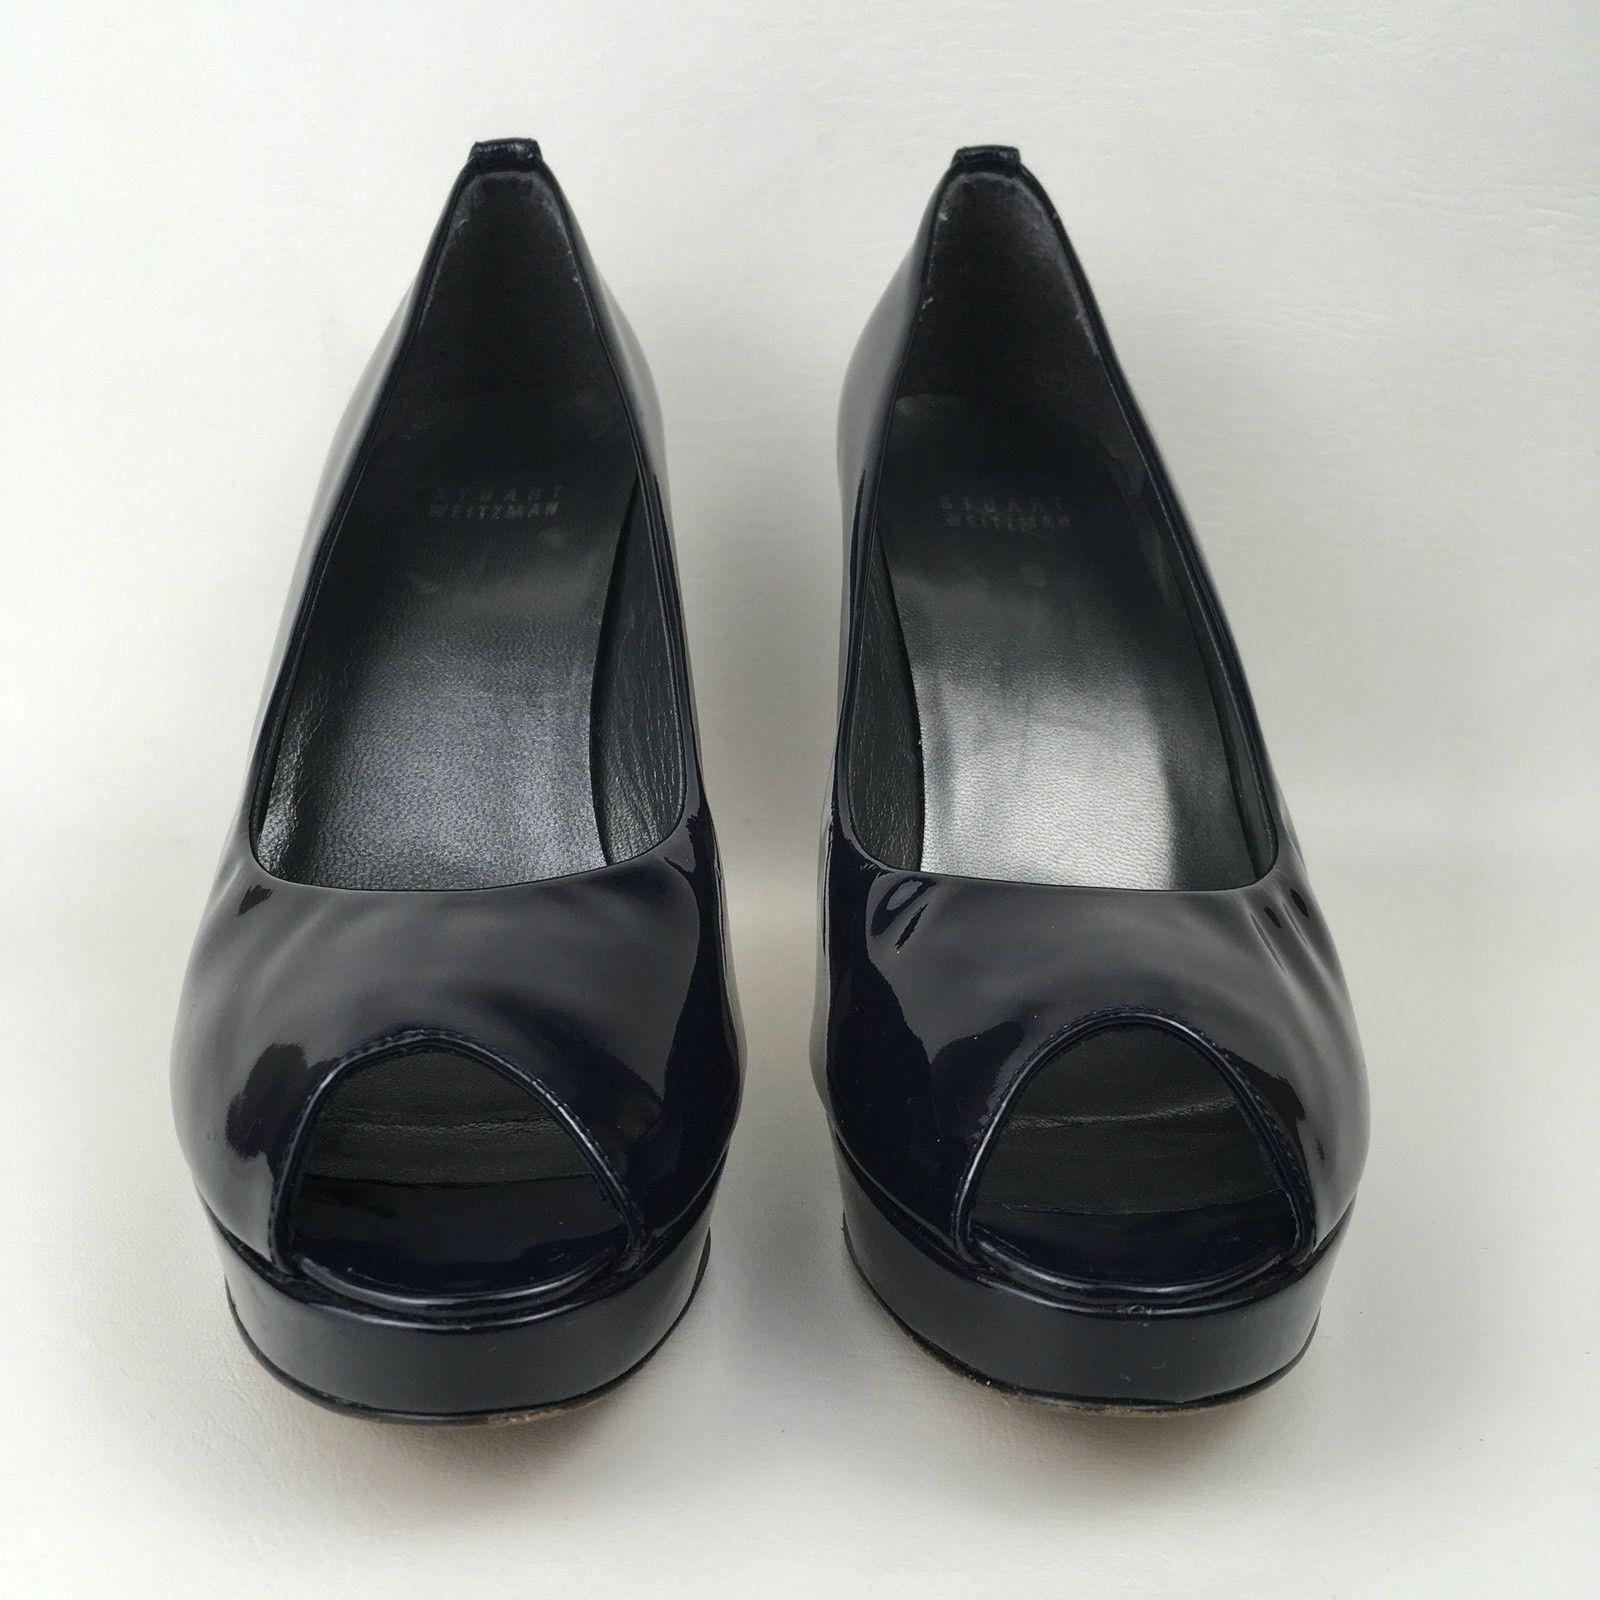 Stuart Weitzman Ladies Navy Patent Peep Toe Shoes US 8.5 UK 6